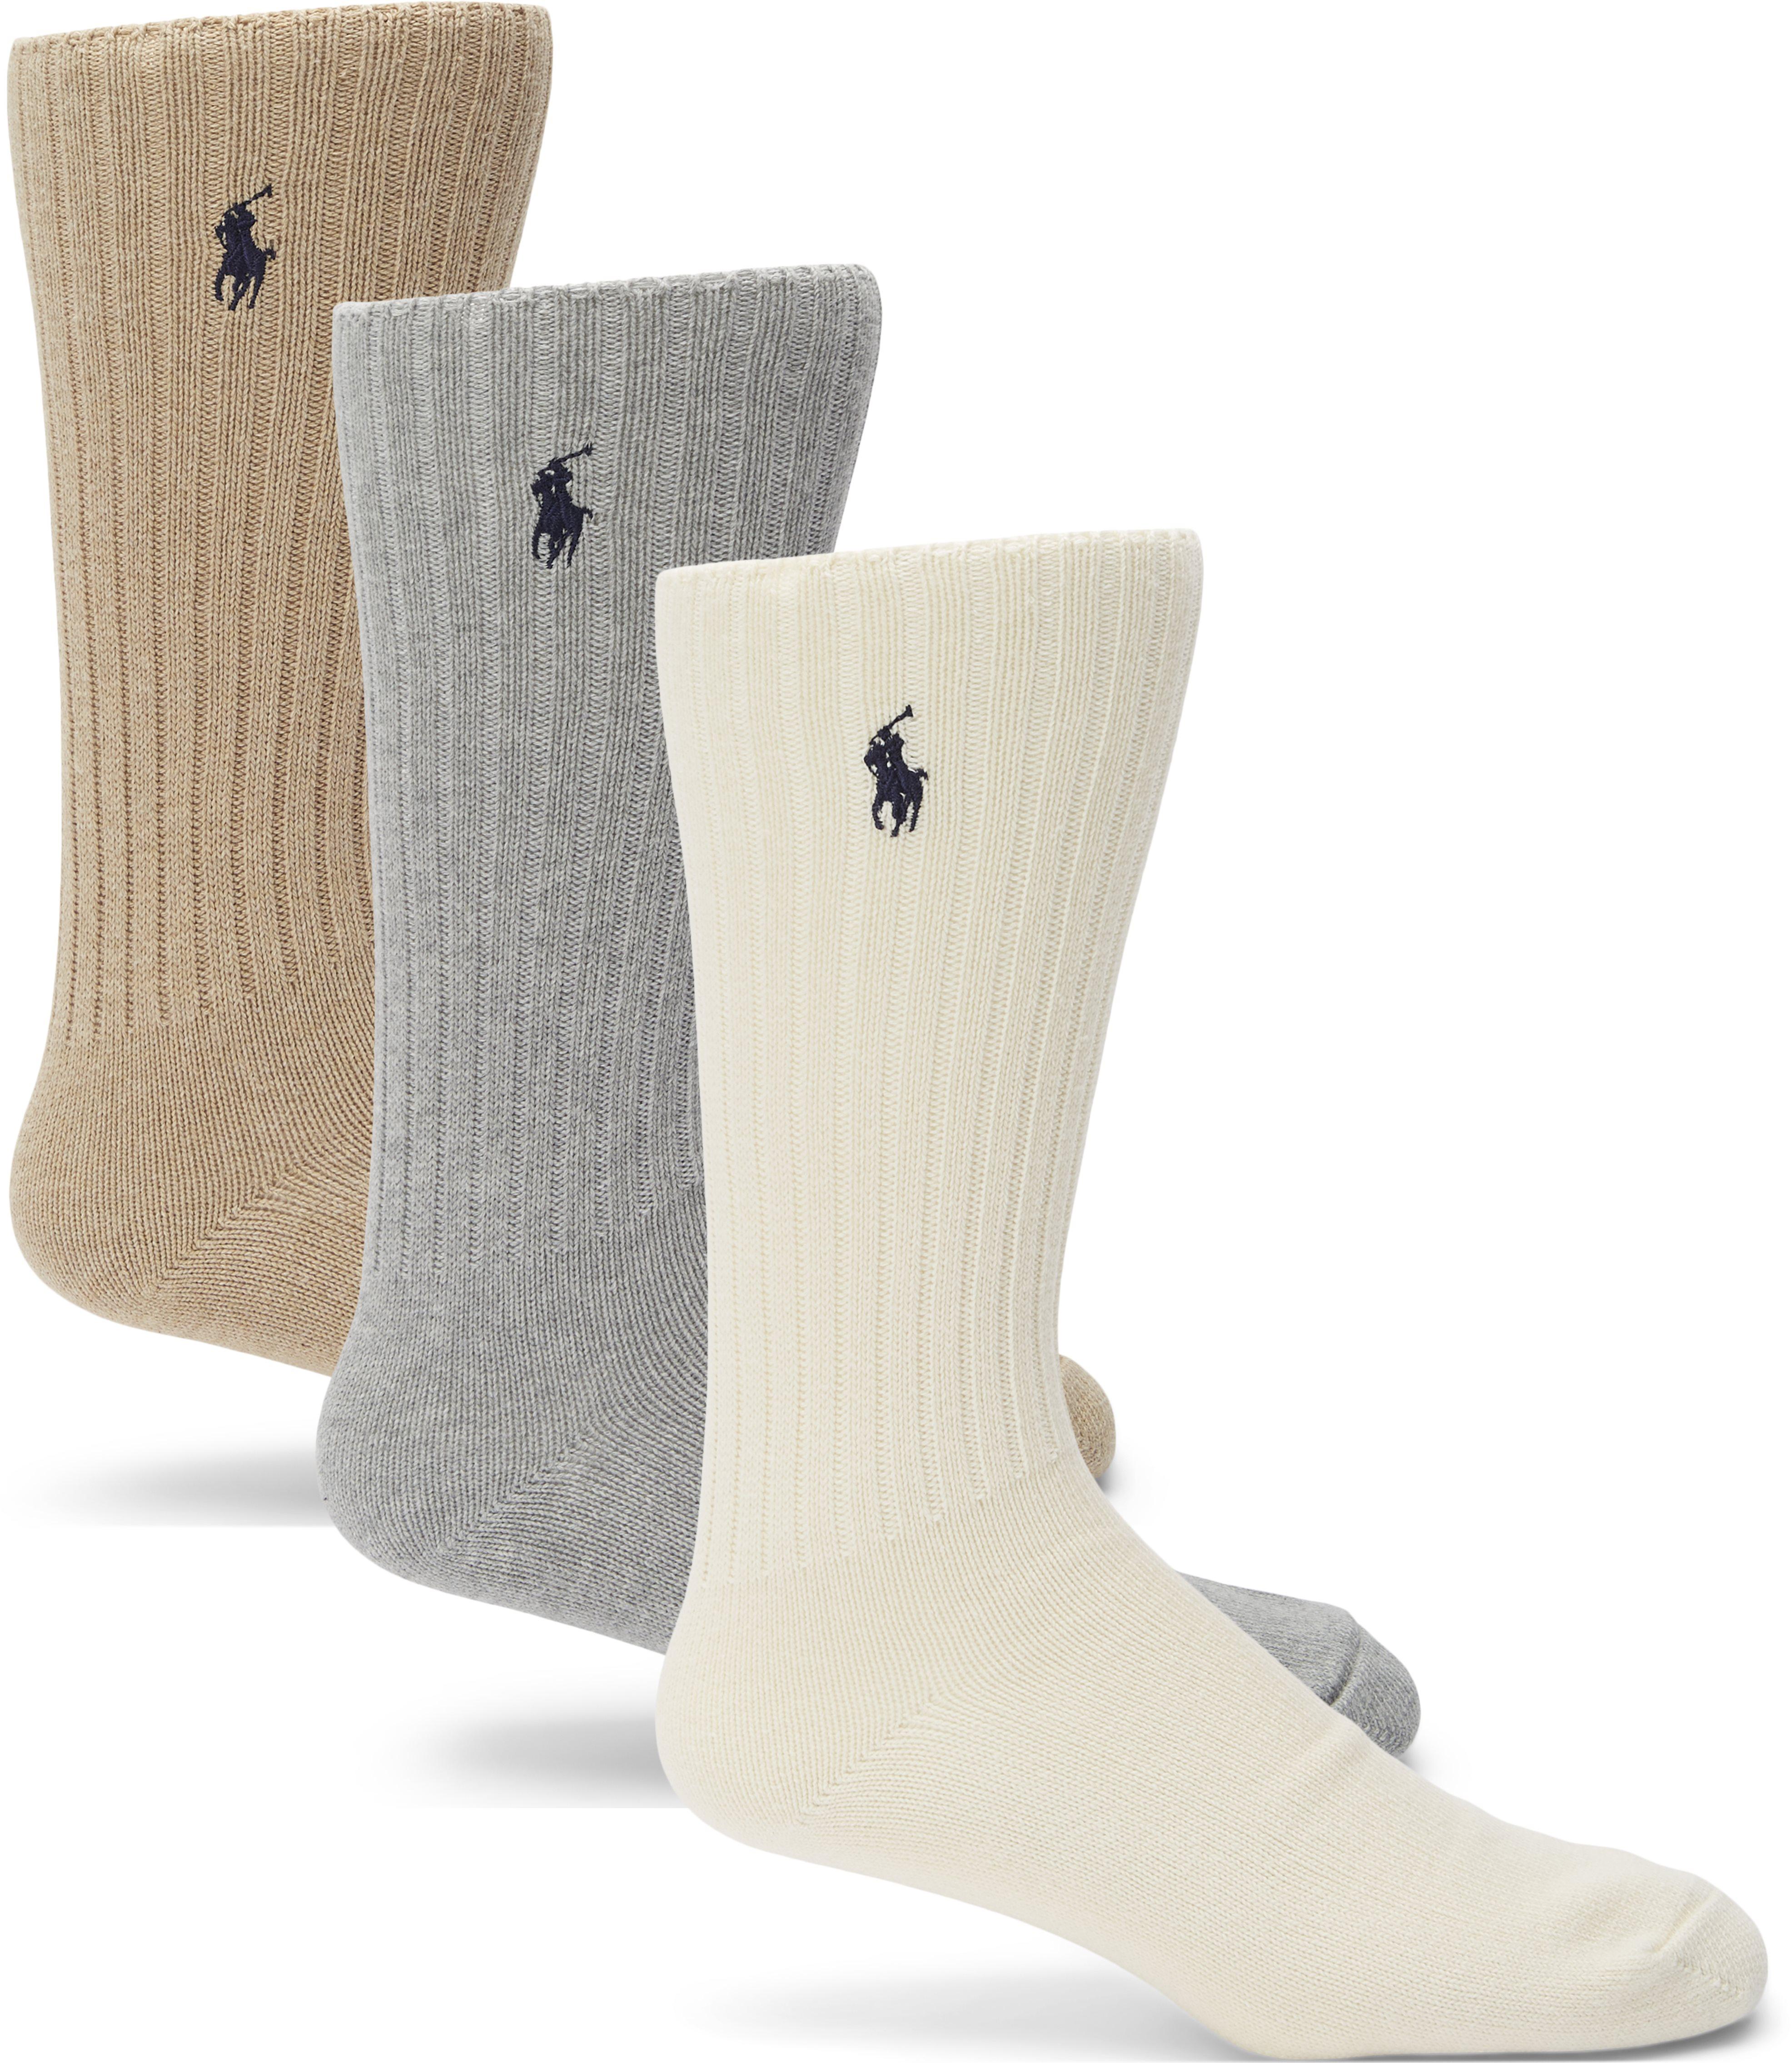 3 Pack socks - Strømper - Multi